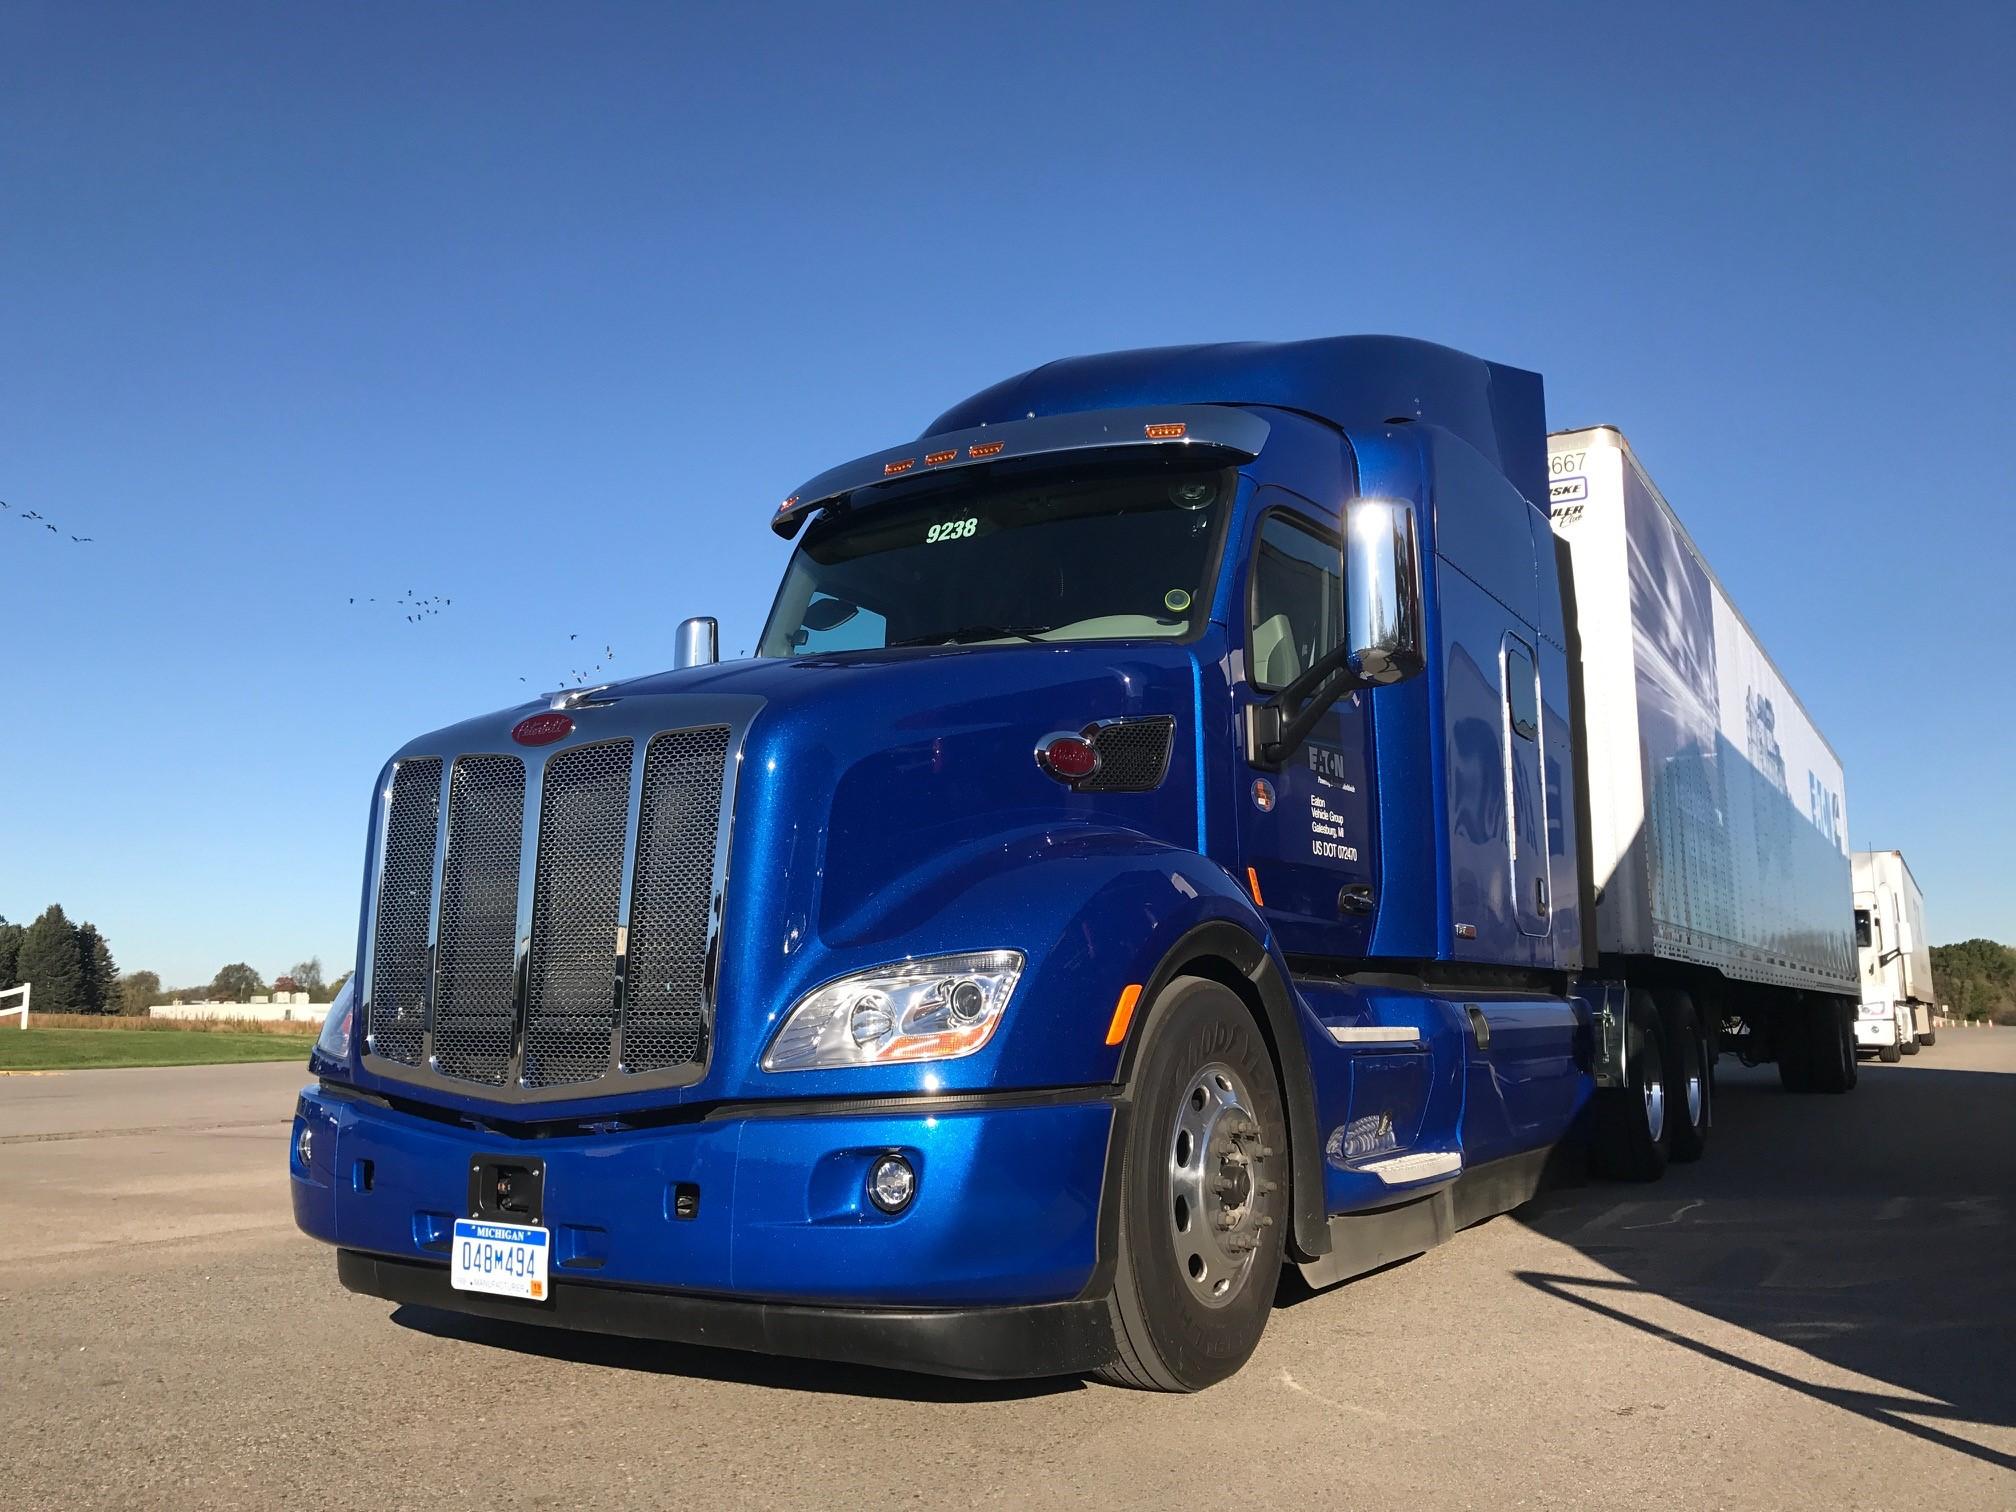 Don't call it an AMT - Truck News